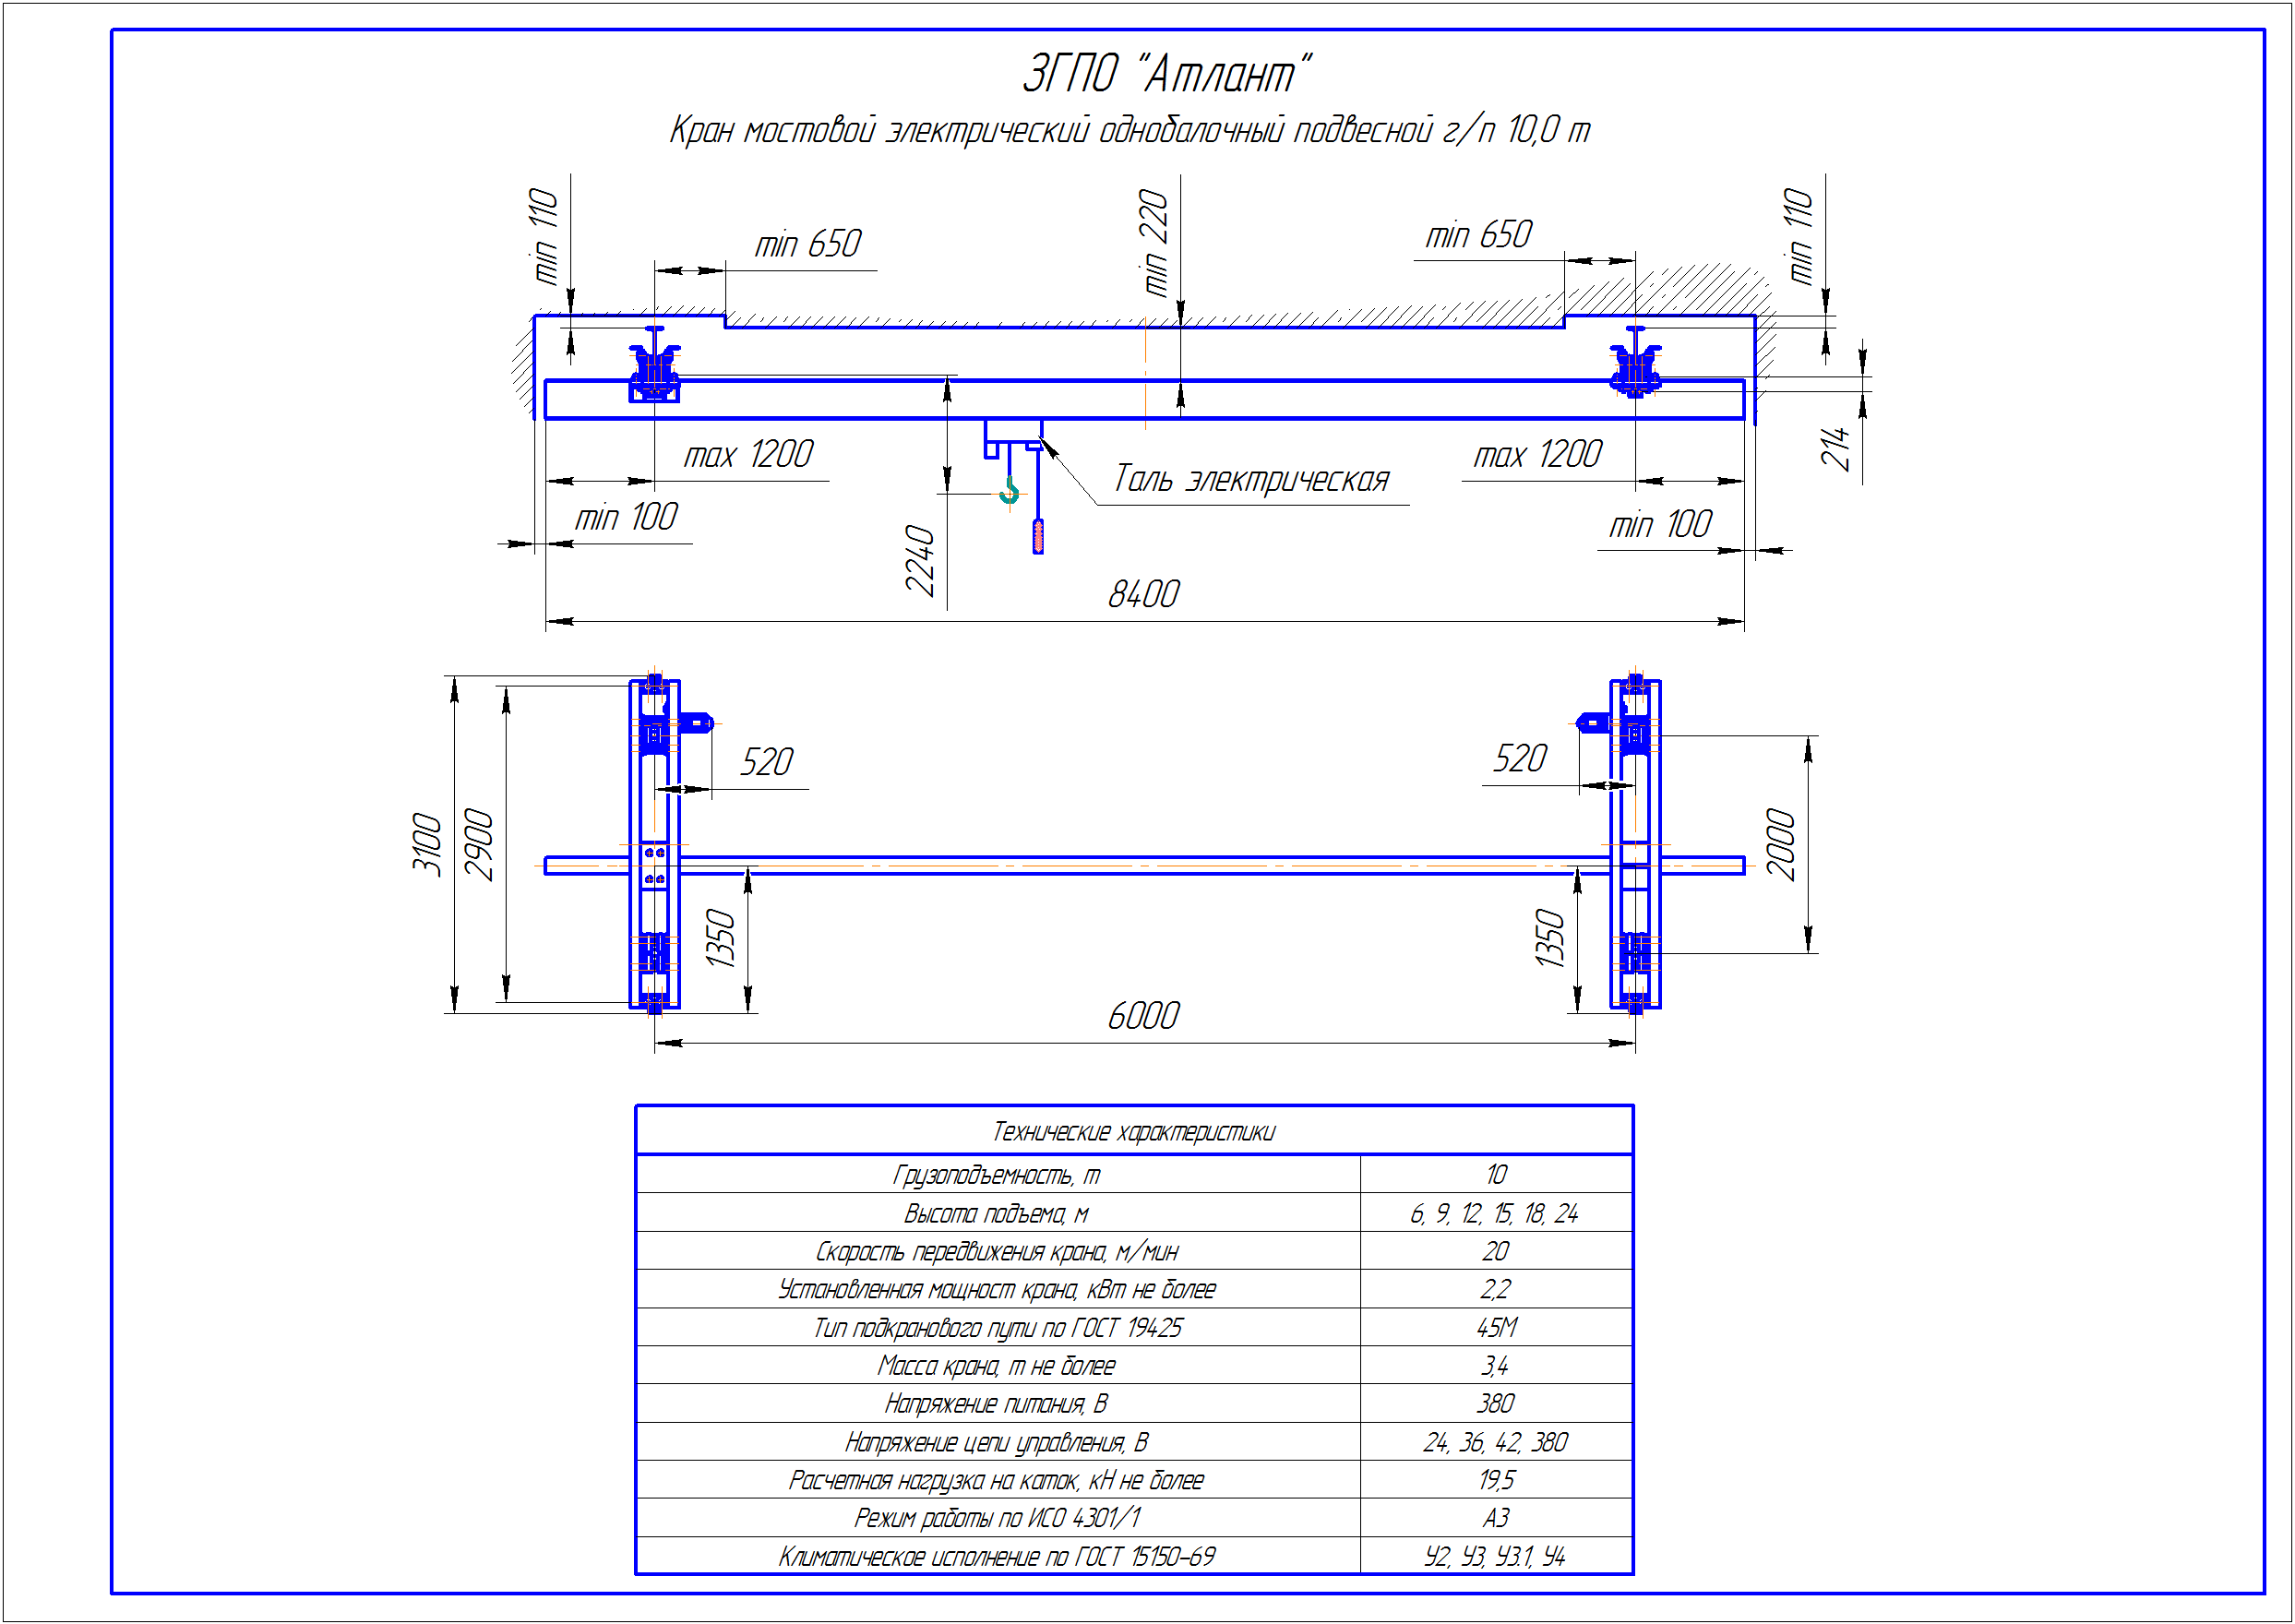 KBP 7 2 - Подвесная кран балка